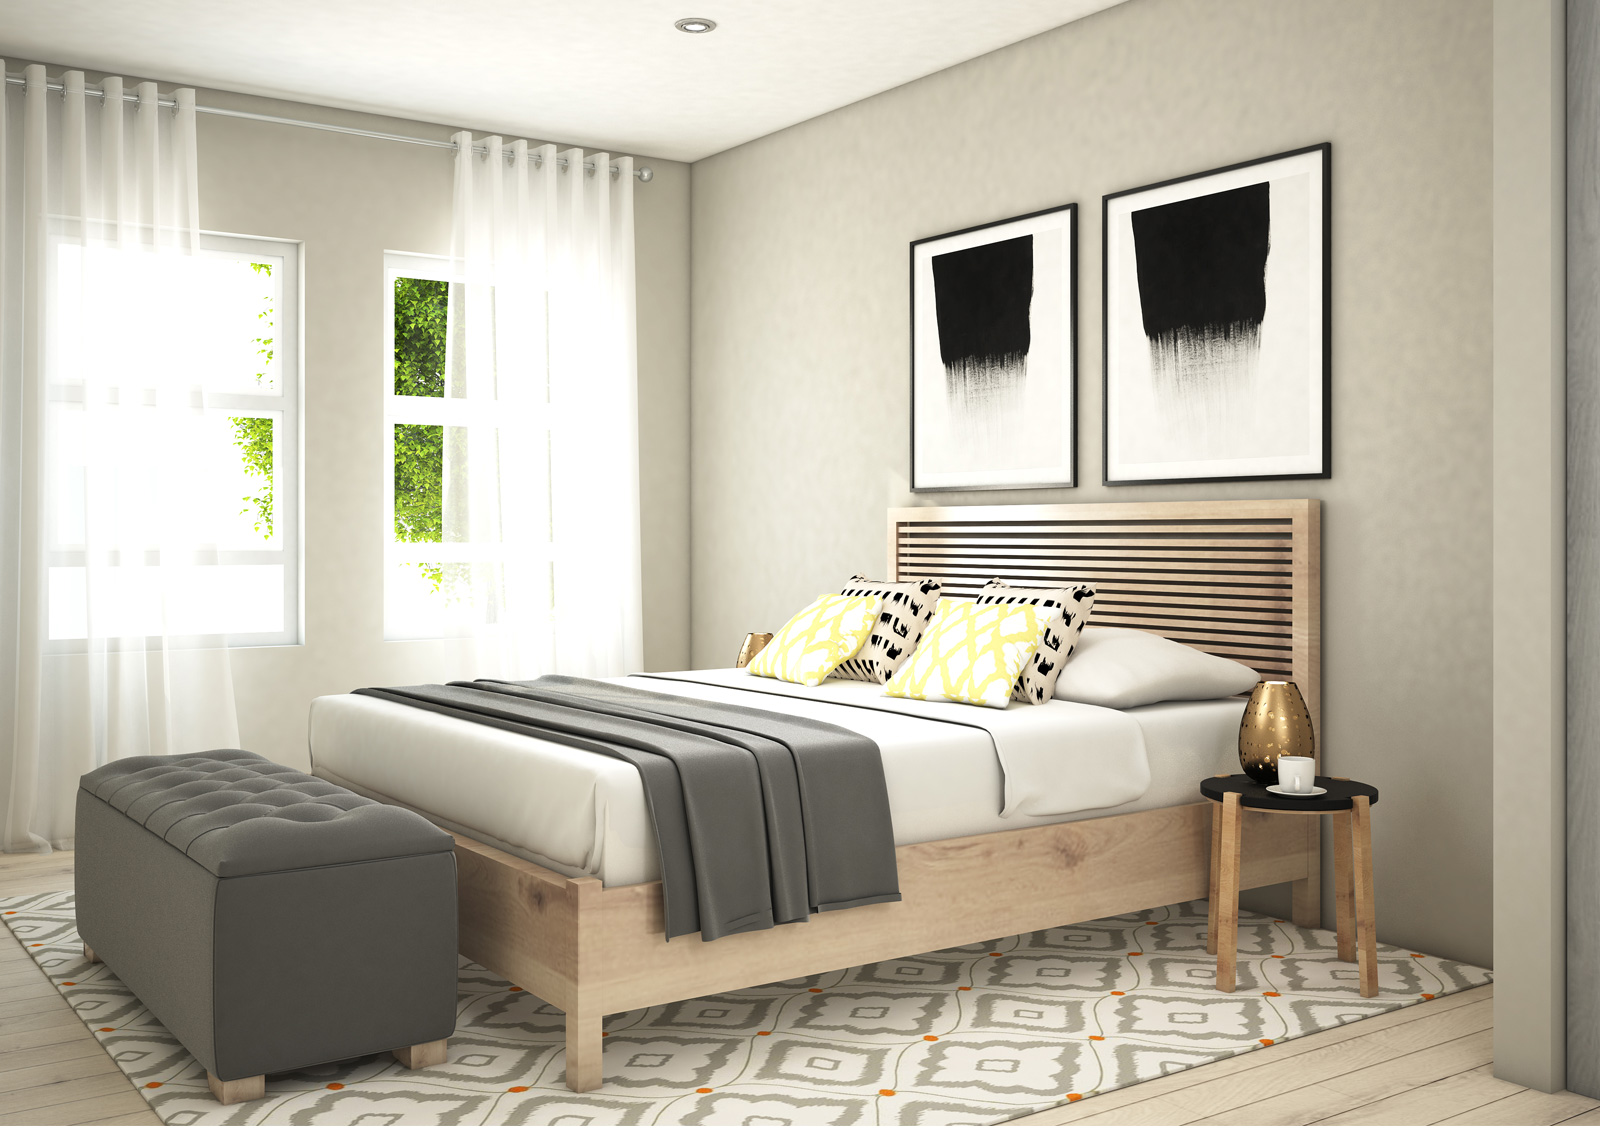 Passfields-Interior-Bedroom-View